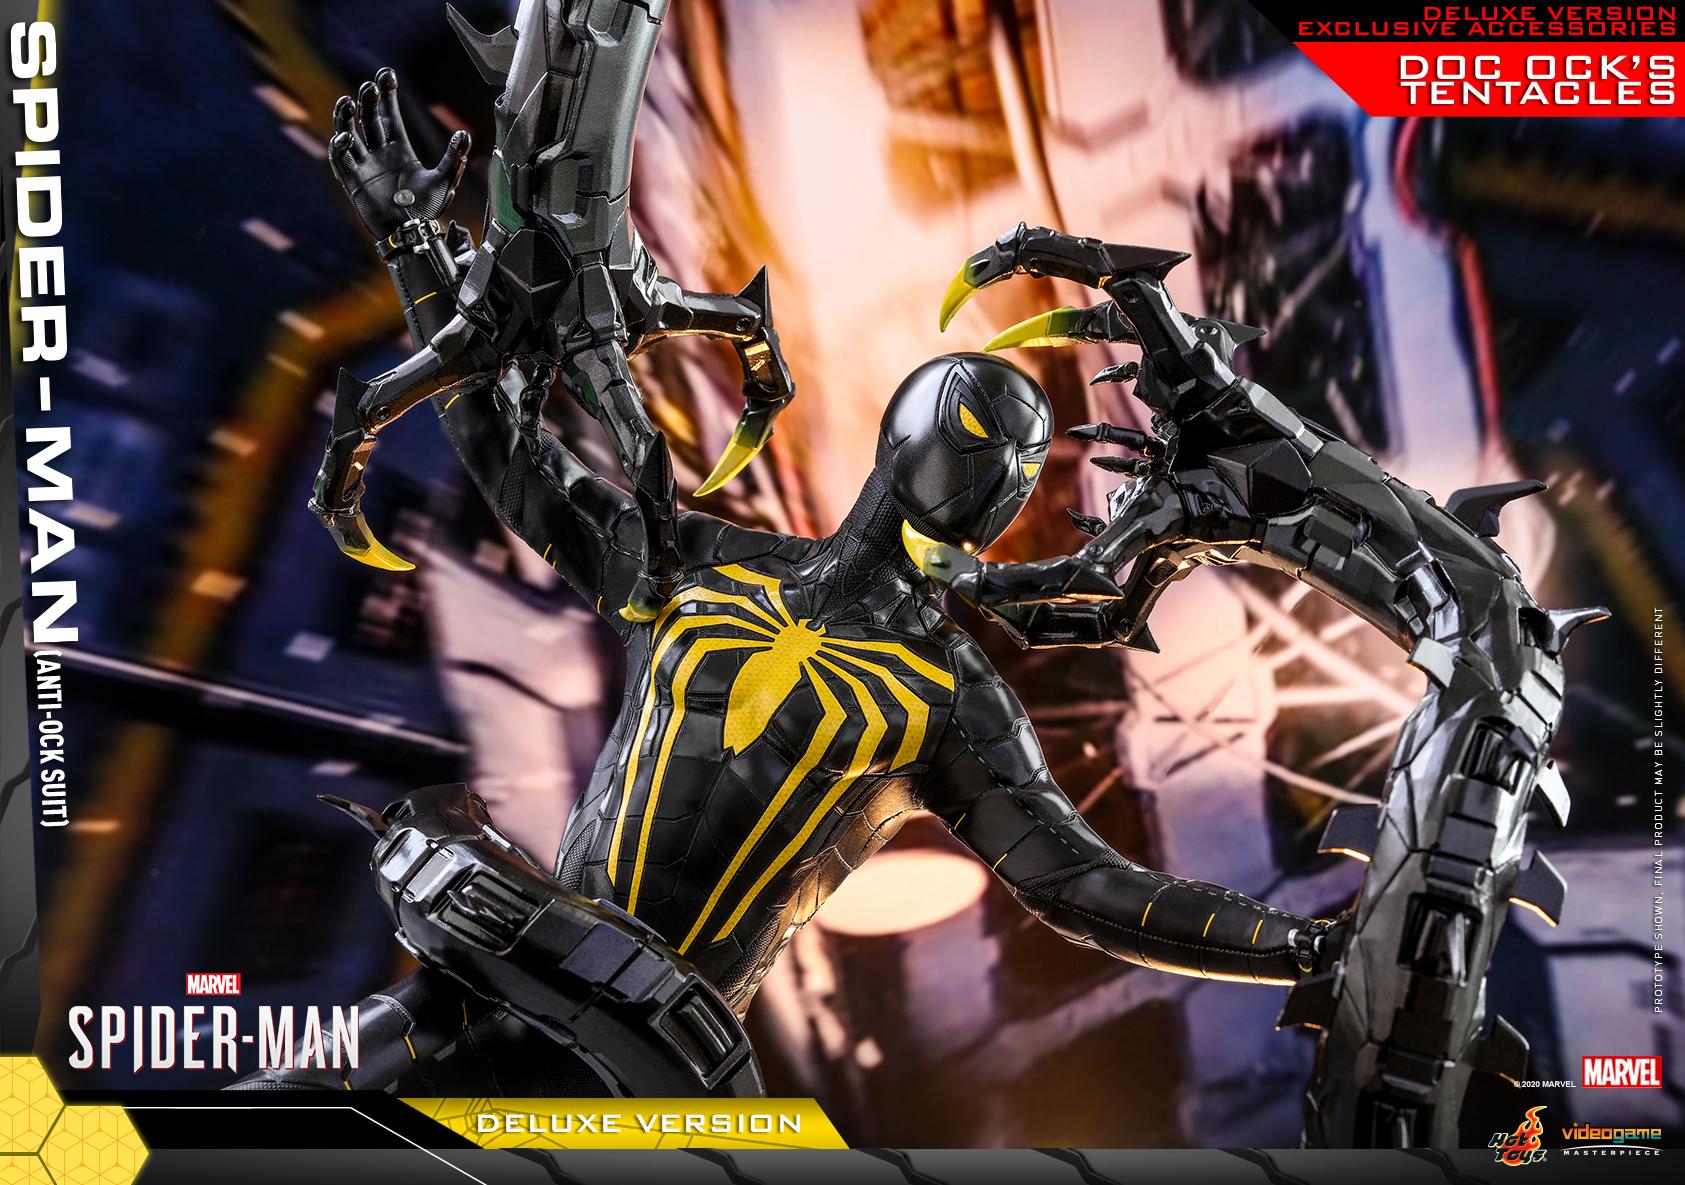 Hot Toys - MSM - Spider-Man (Anti-Ock Suit) collectible figure (Deluxe)_PR10